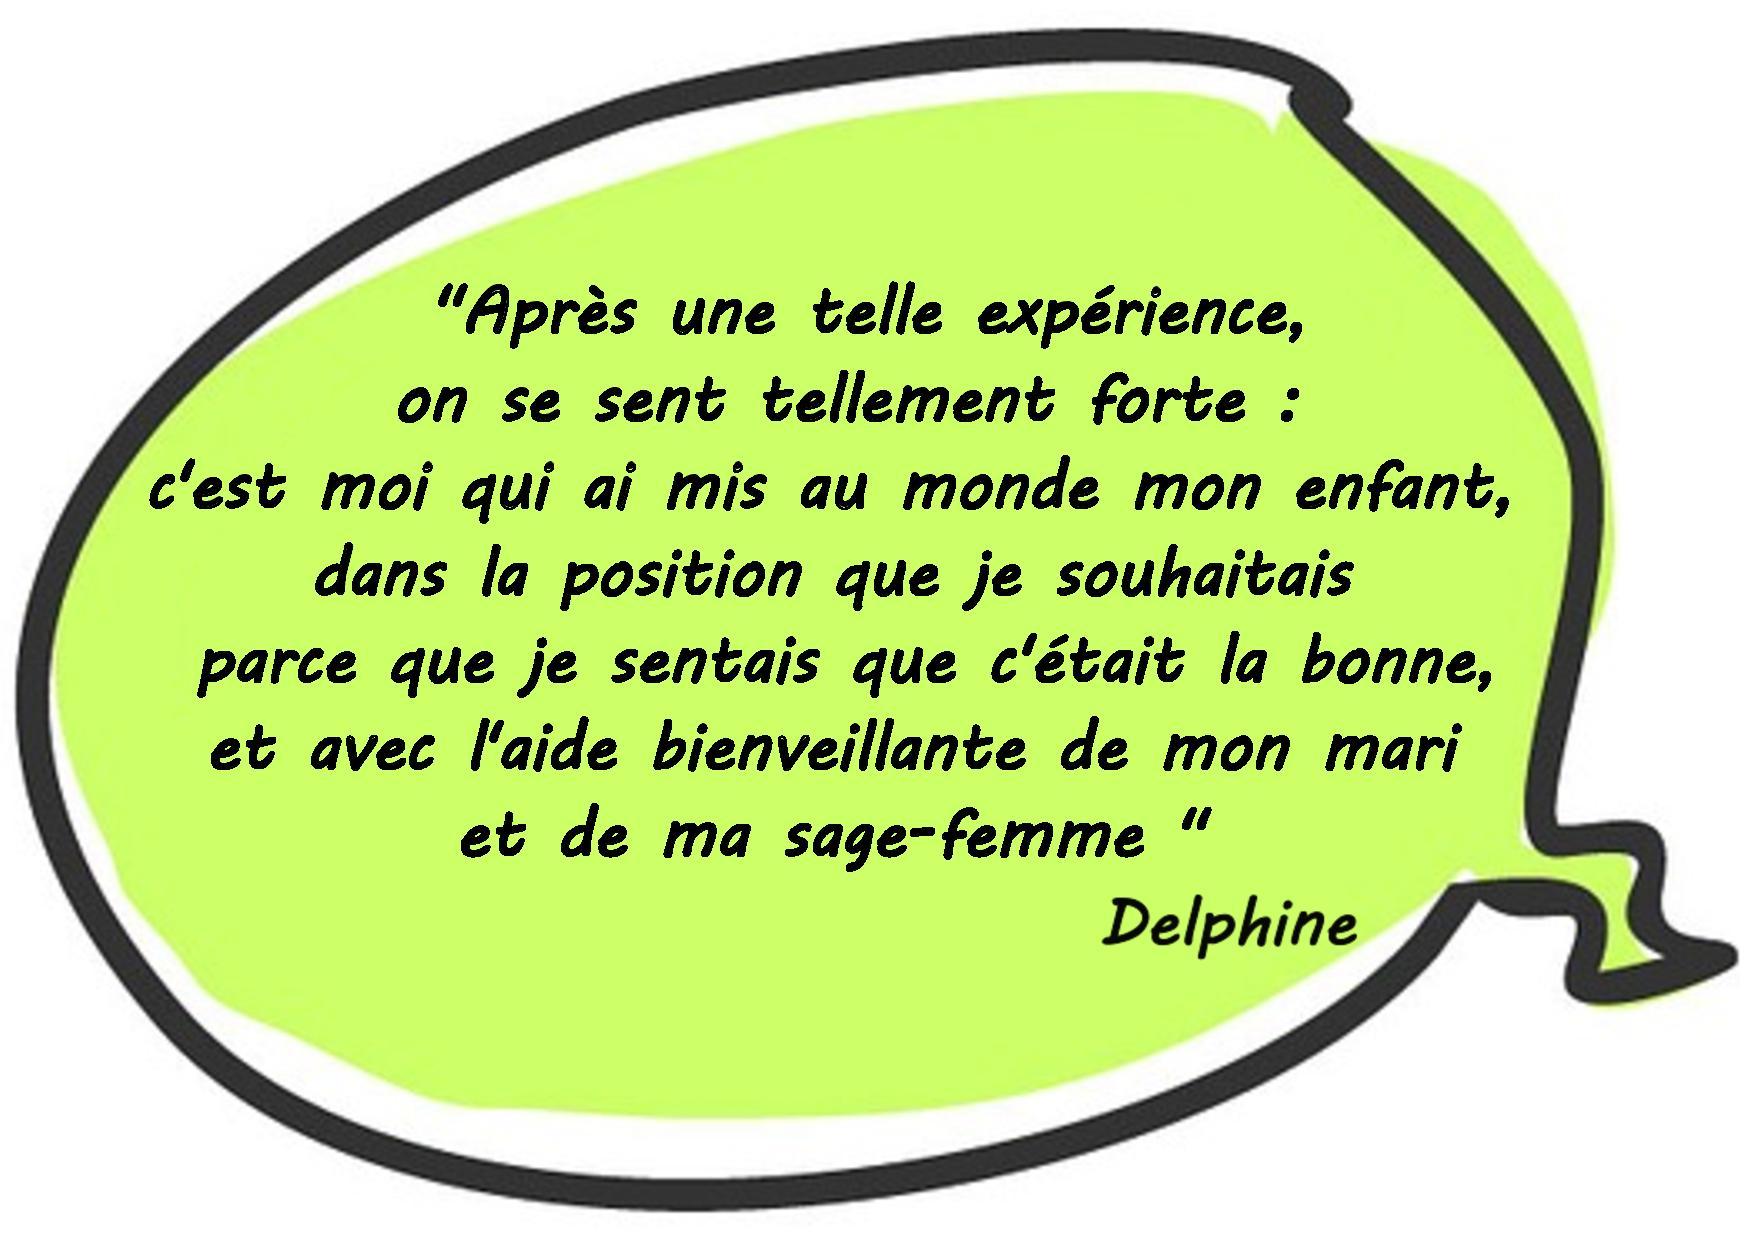 image Delphine2.jpg (0.2MB)